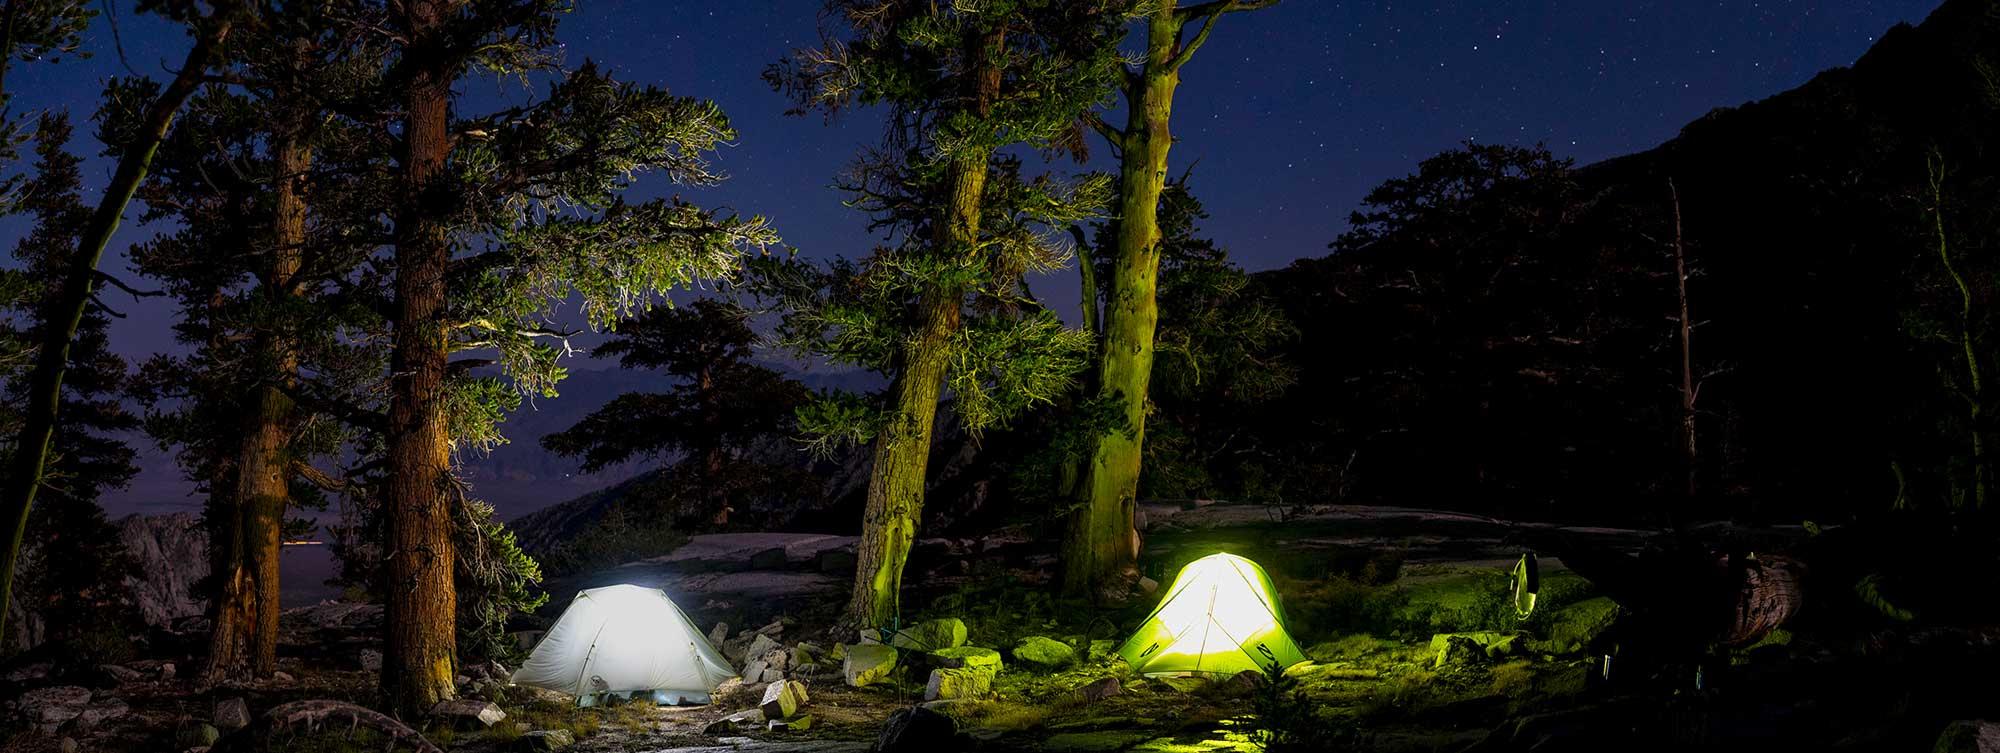 camping-photo-workshop